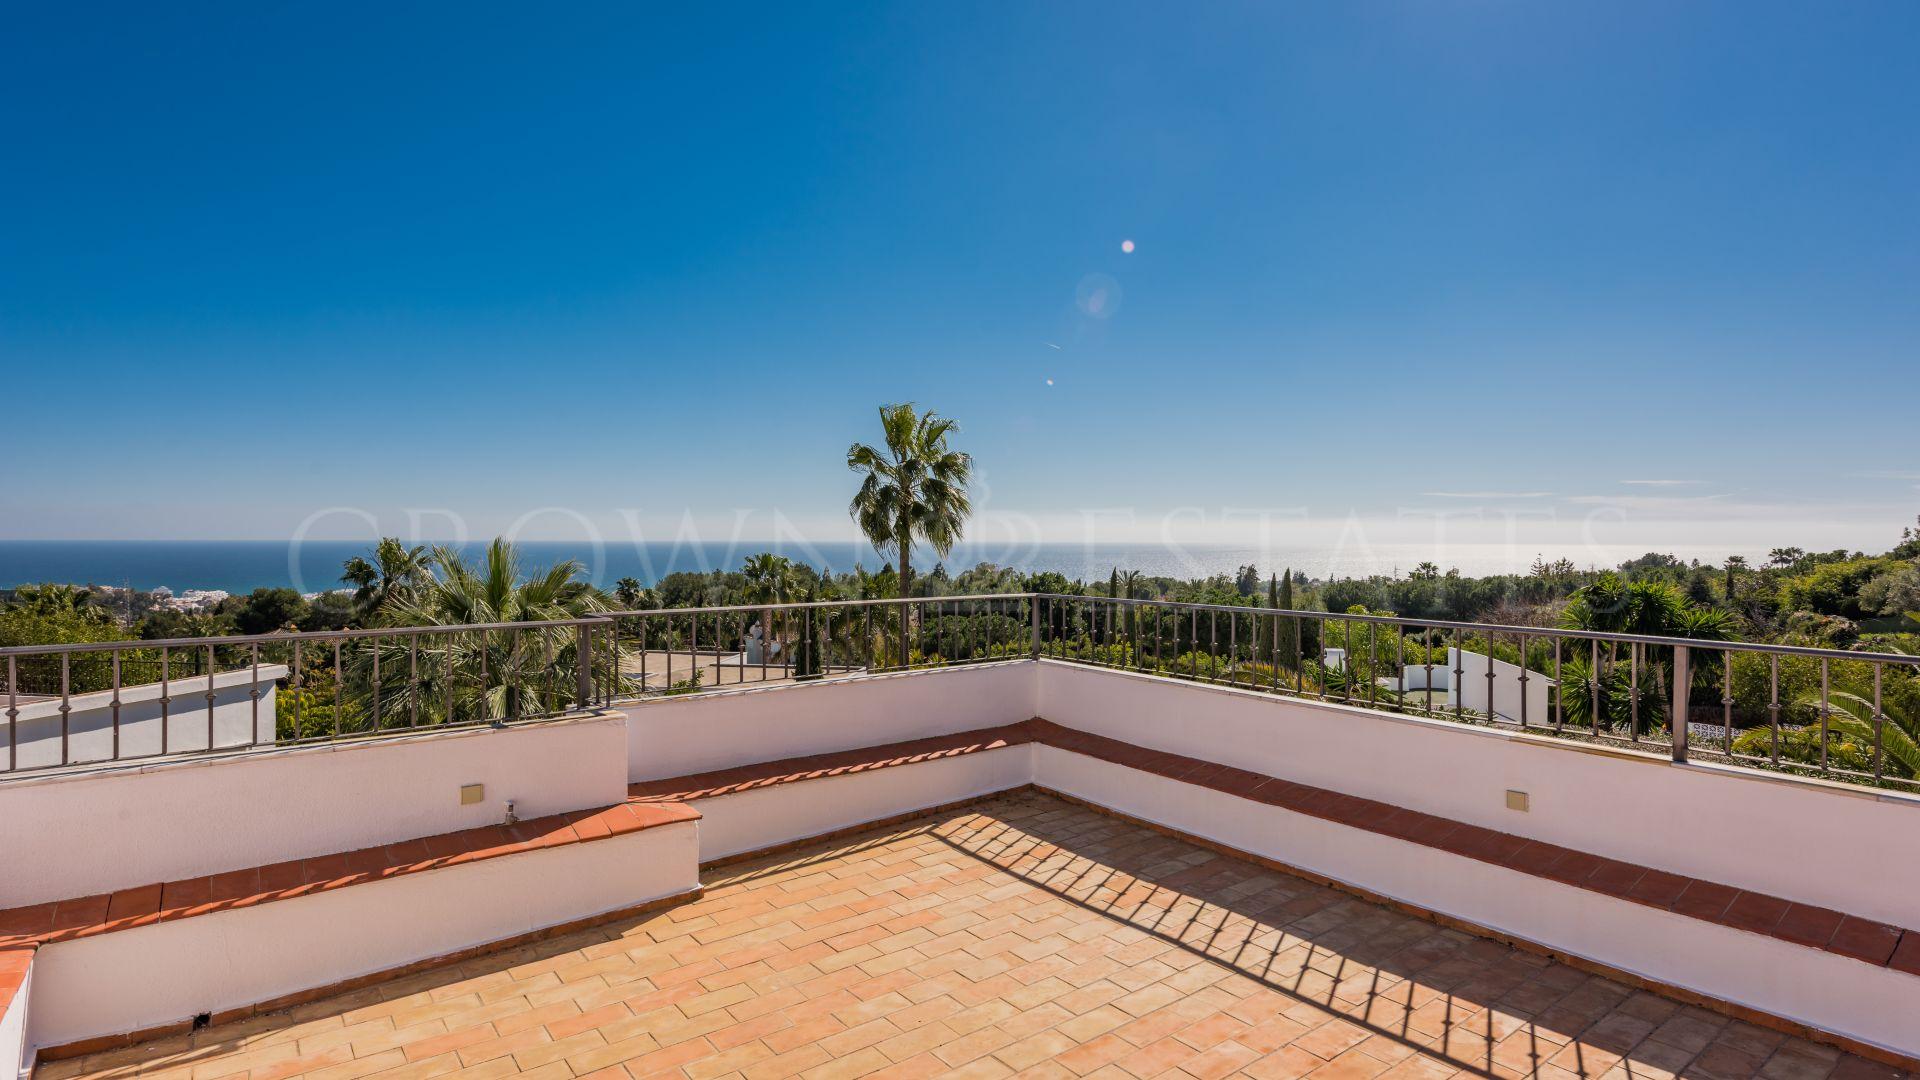 Villa in the private gated community of Altos Reales Marbella